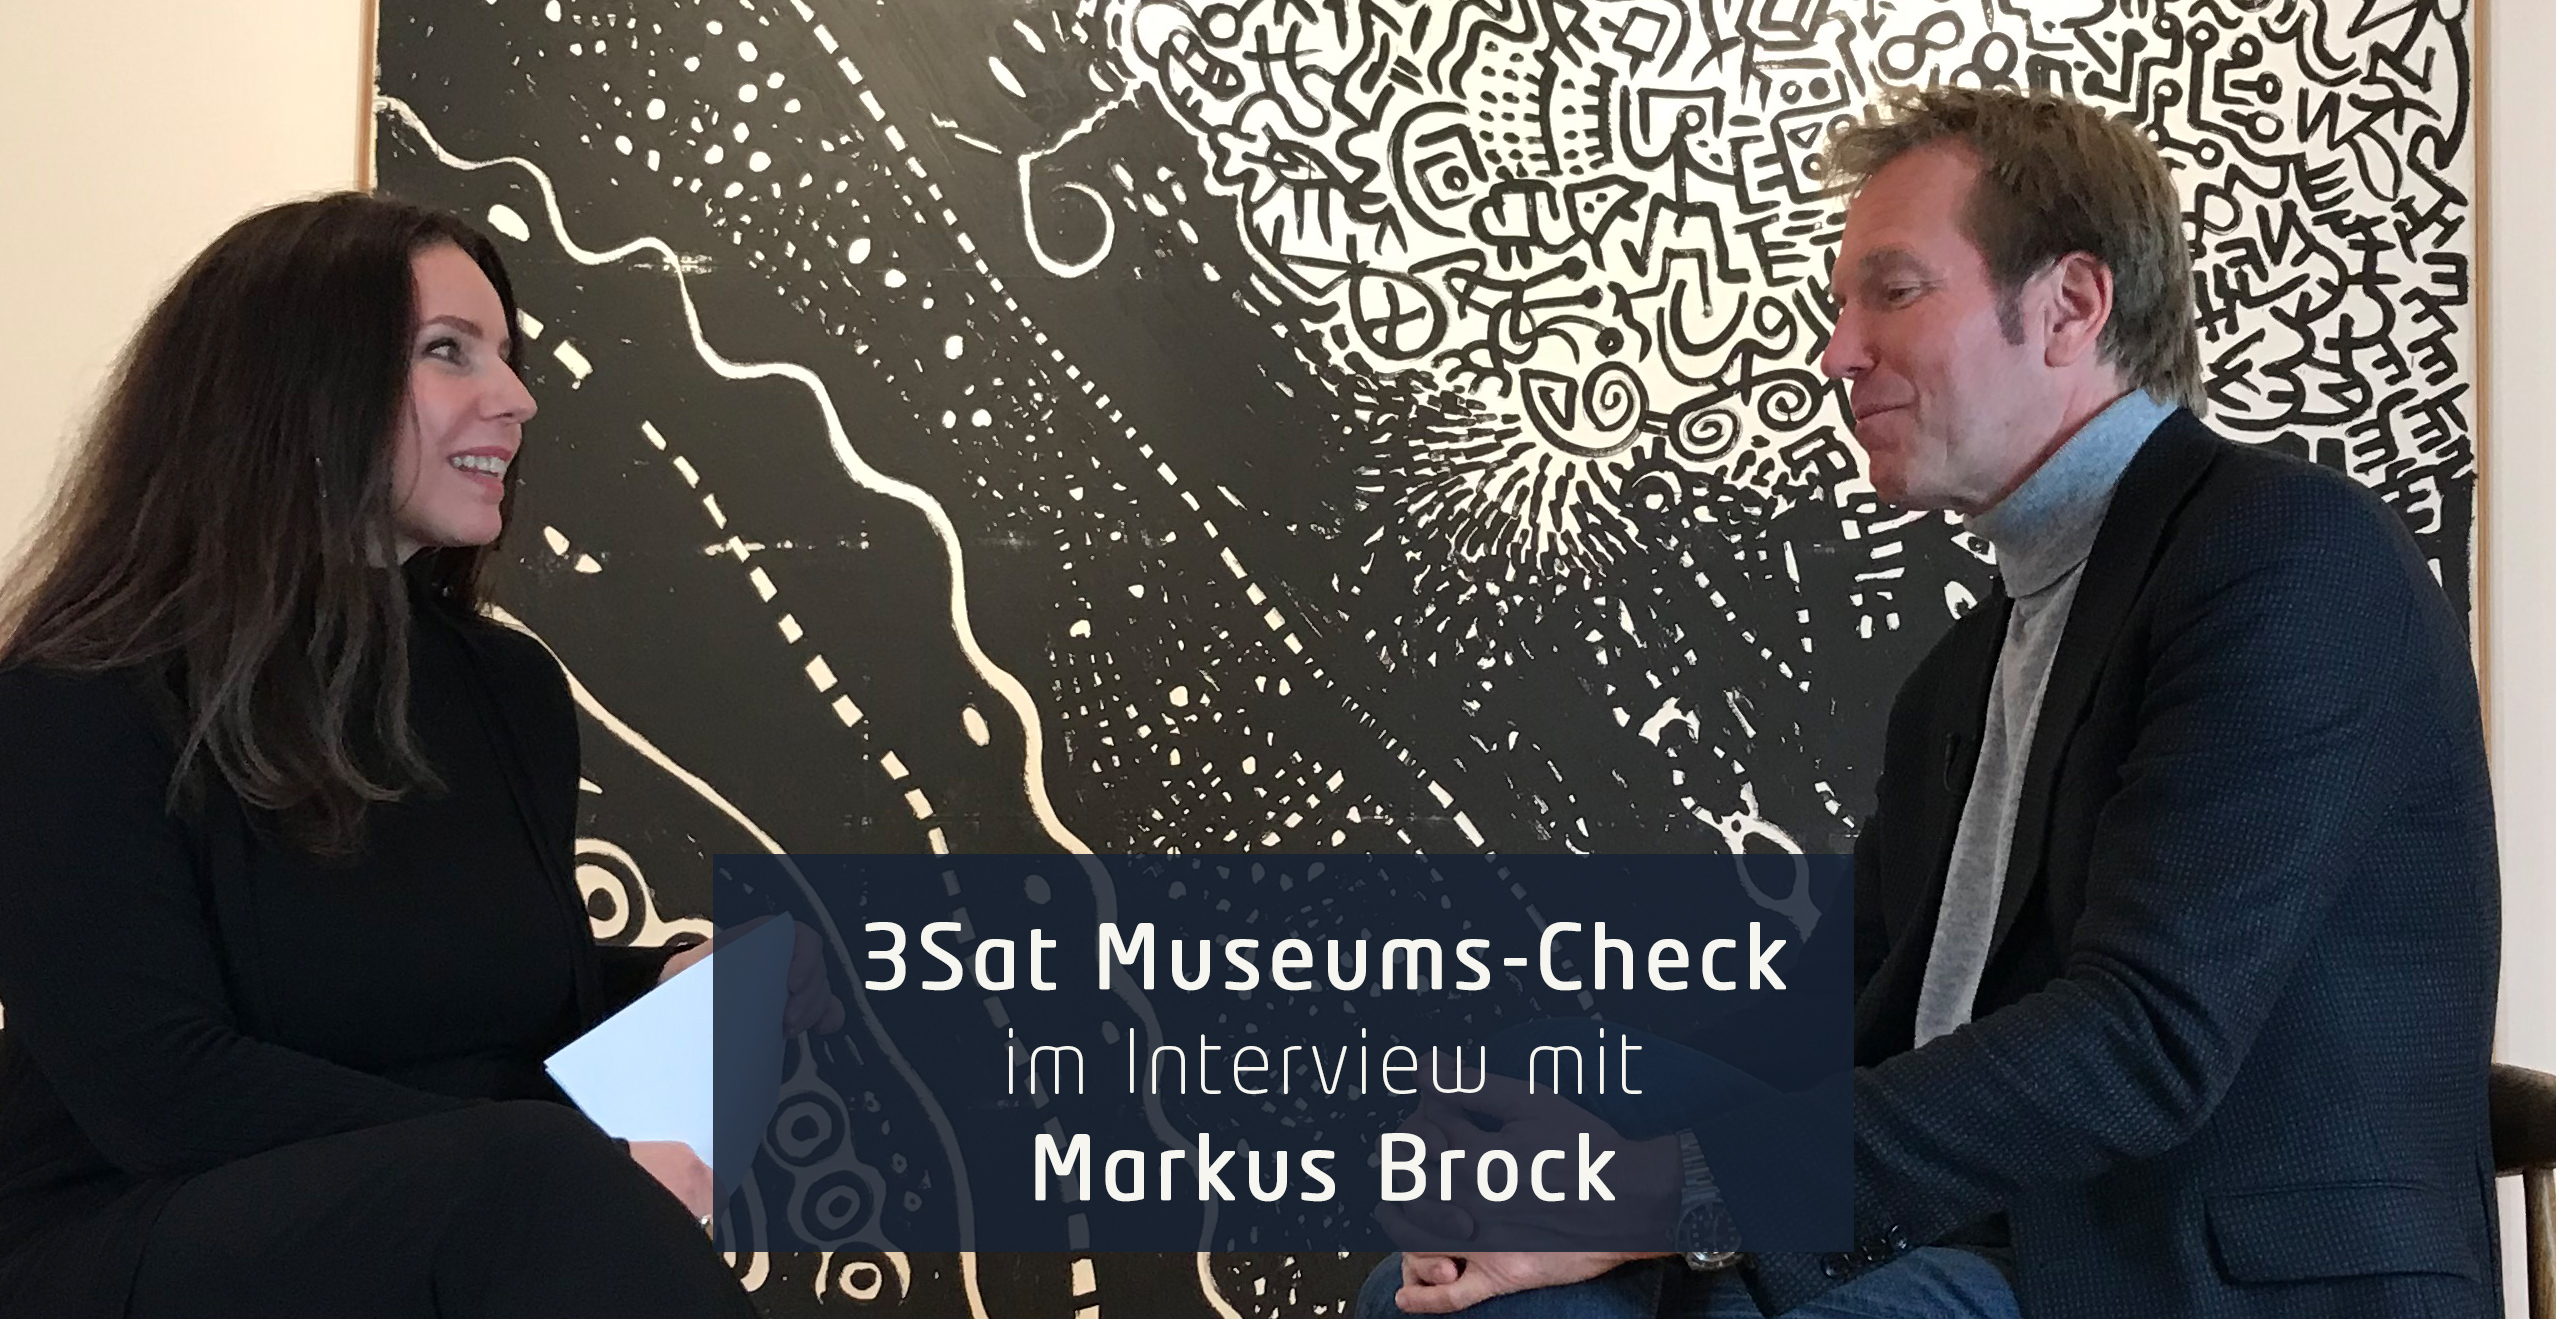 Kunstleben Berlin trifft Markus Brock vom Museums-Check.